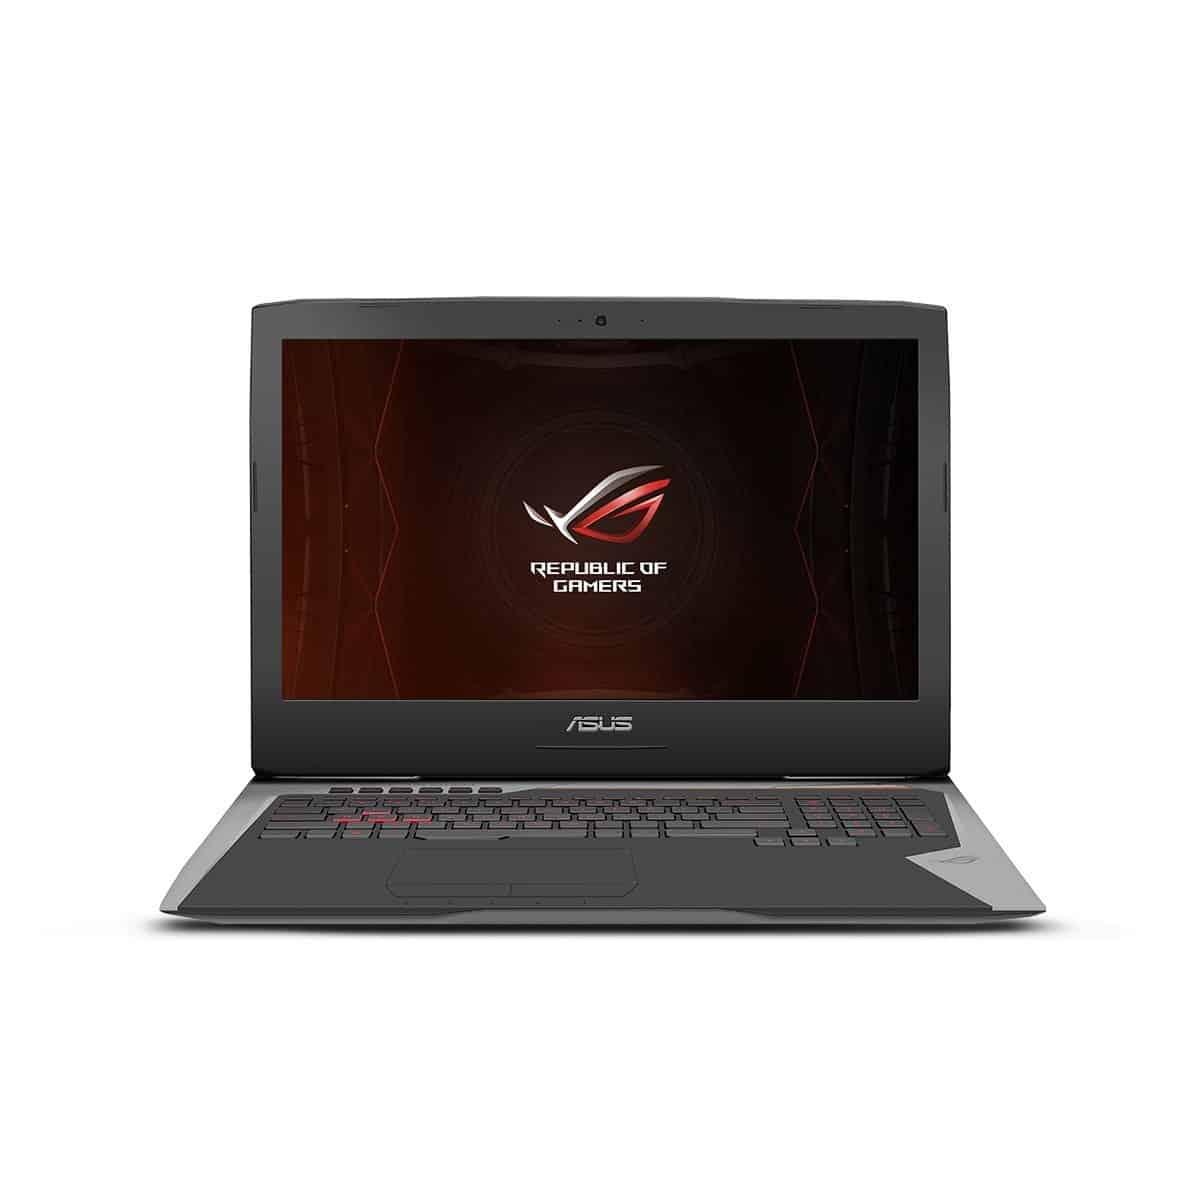 ASUS ROG G752VS OC Edition Gaming Laptop